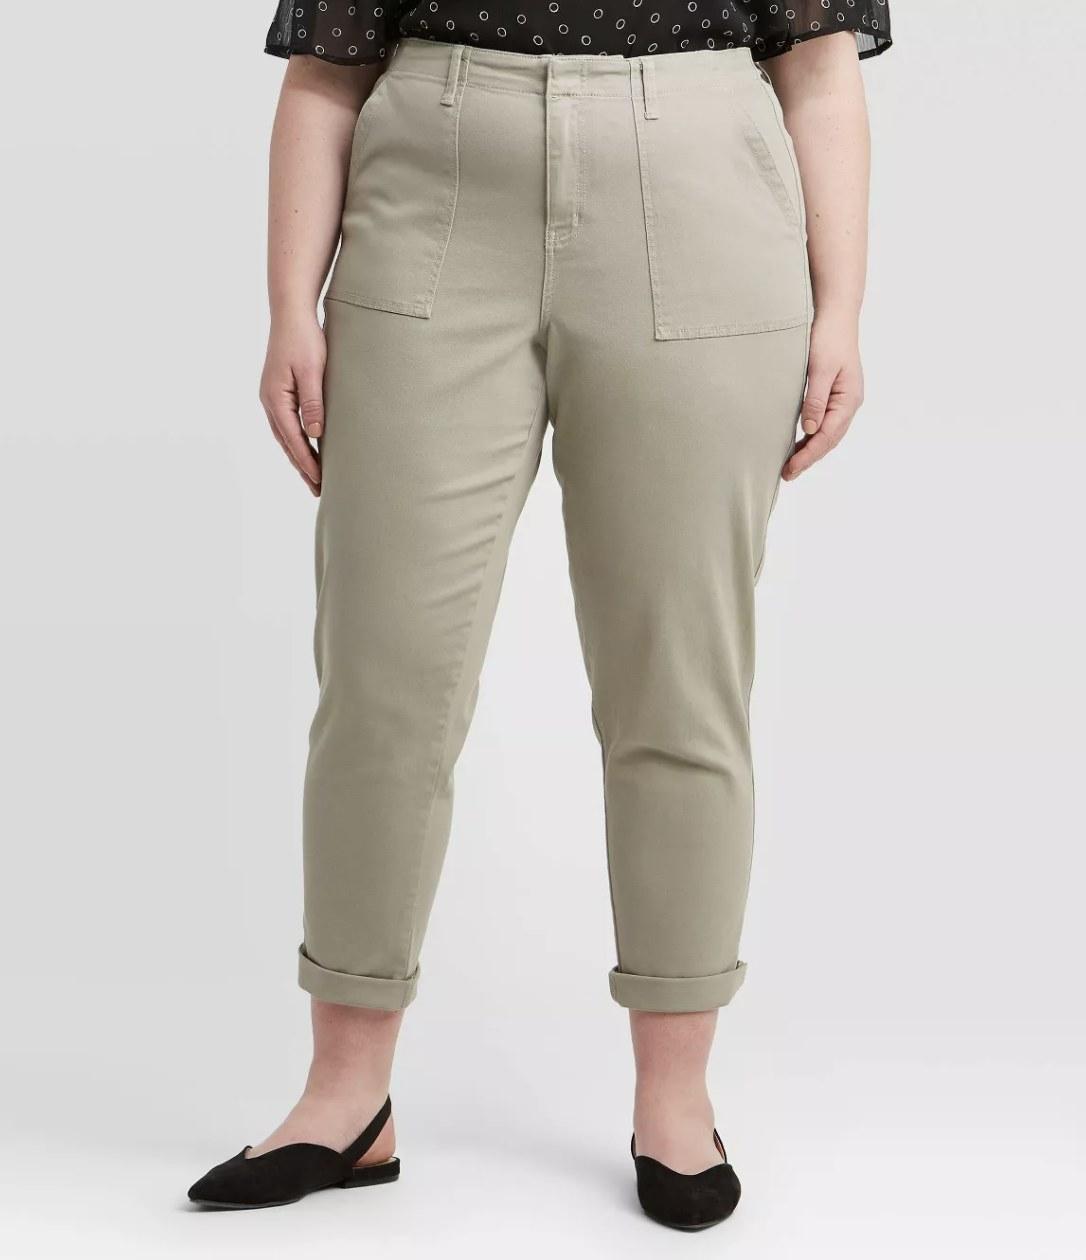 Model wearing the tan pants